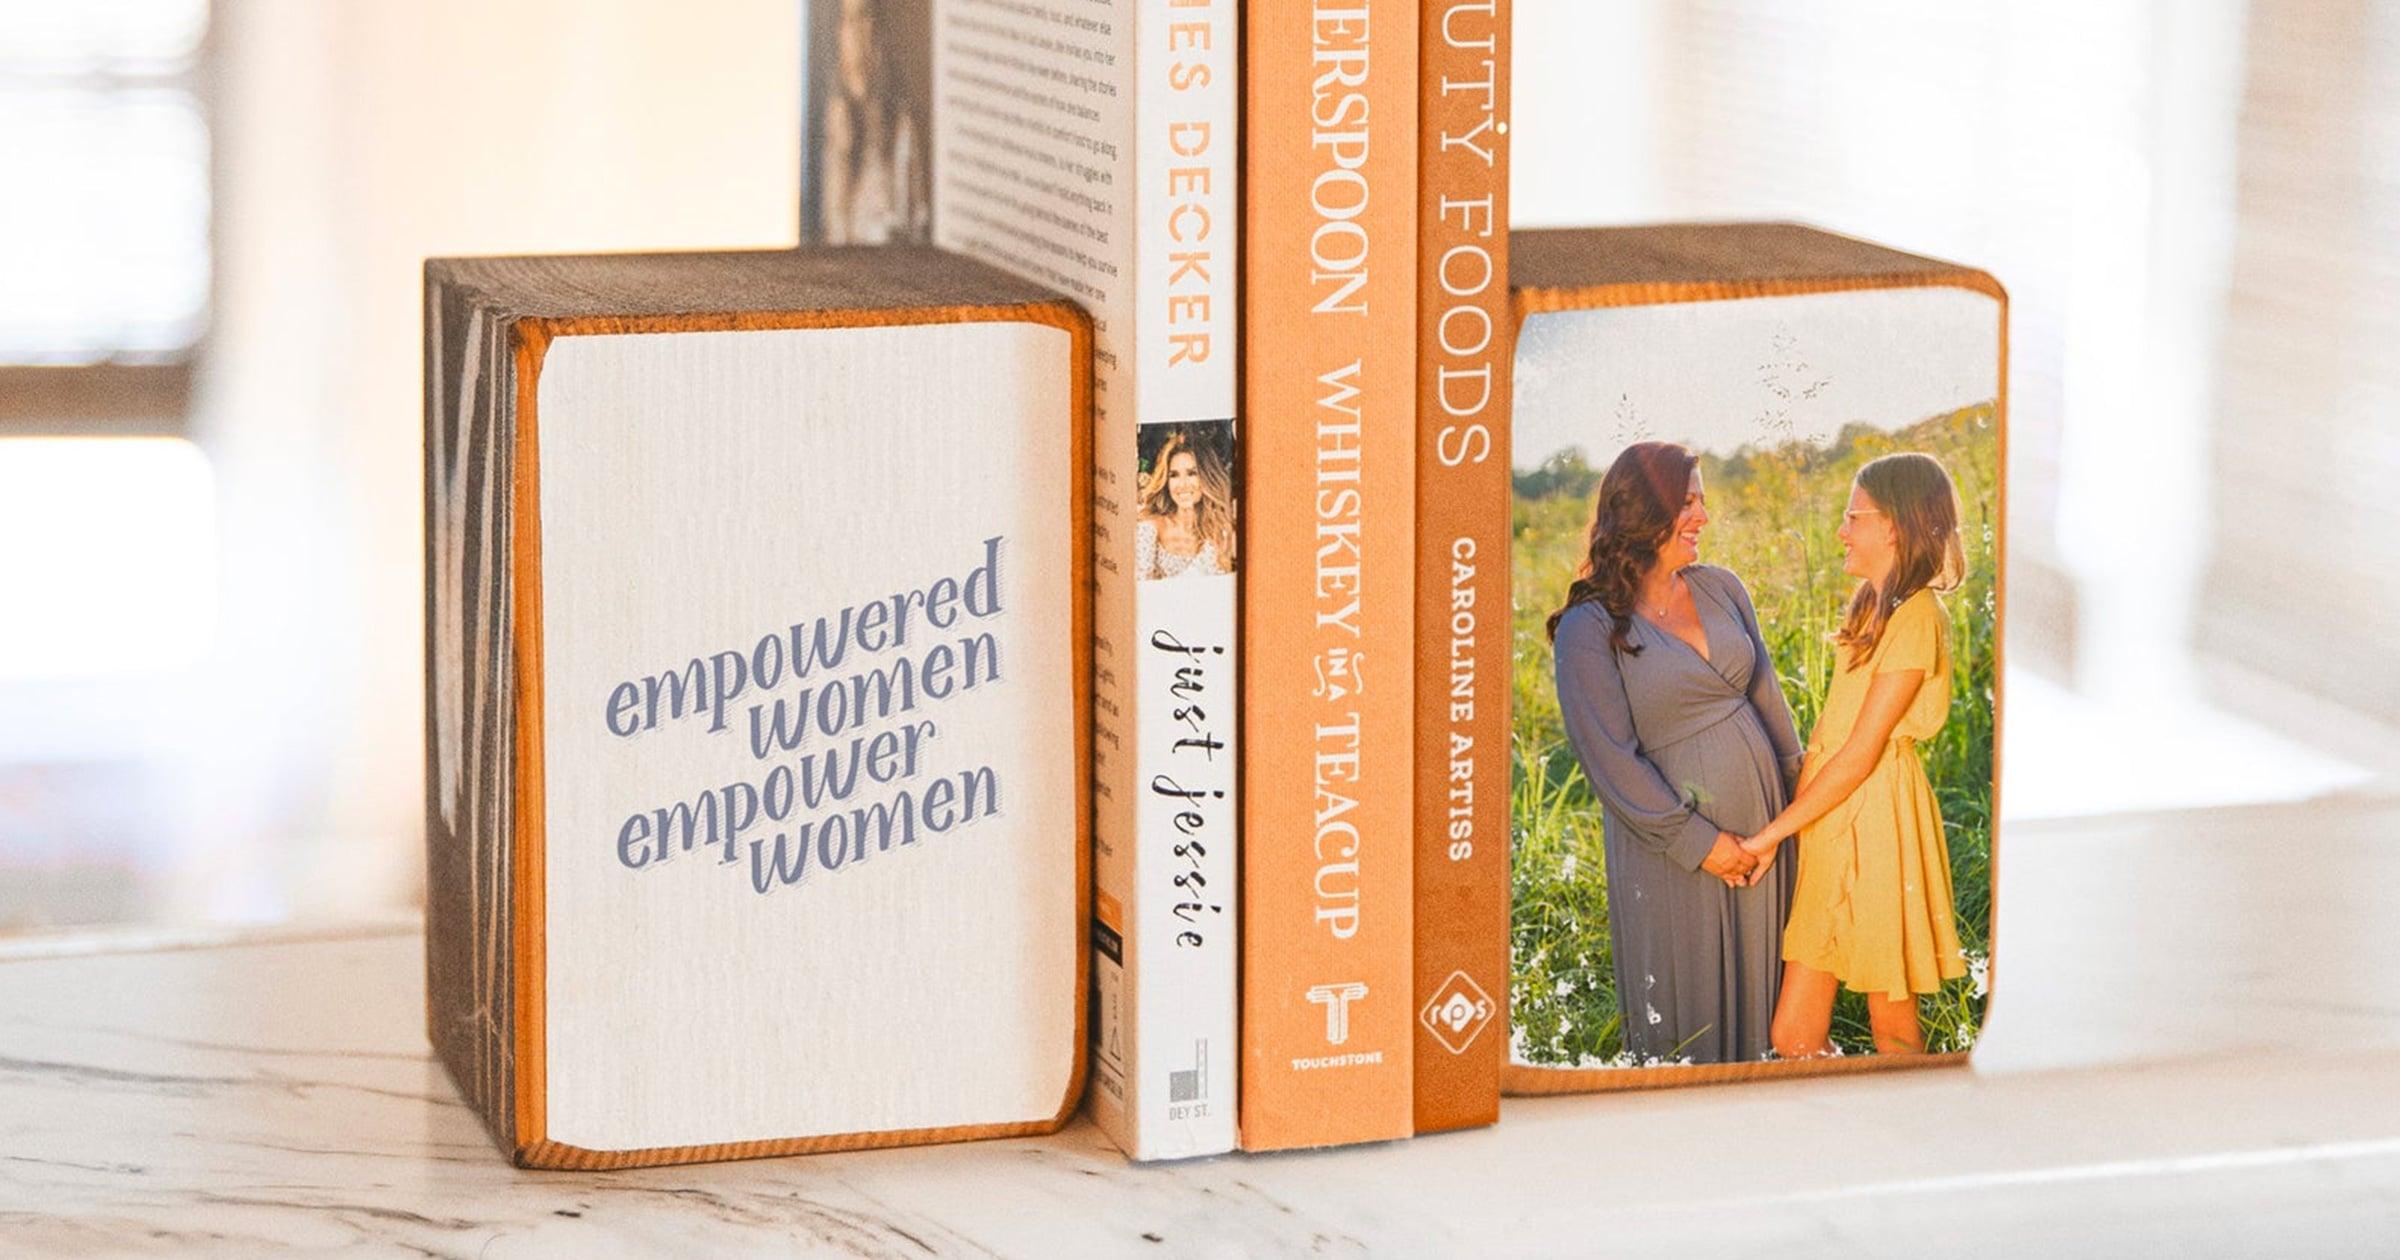 Empowered Women Empower Women Bookends